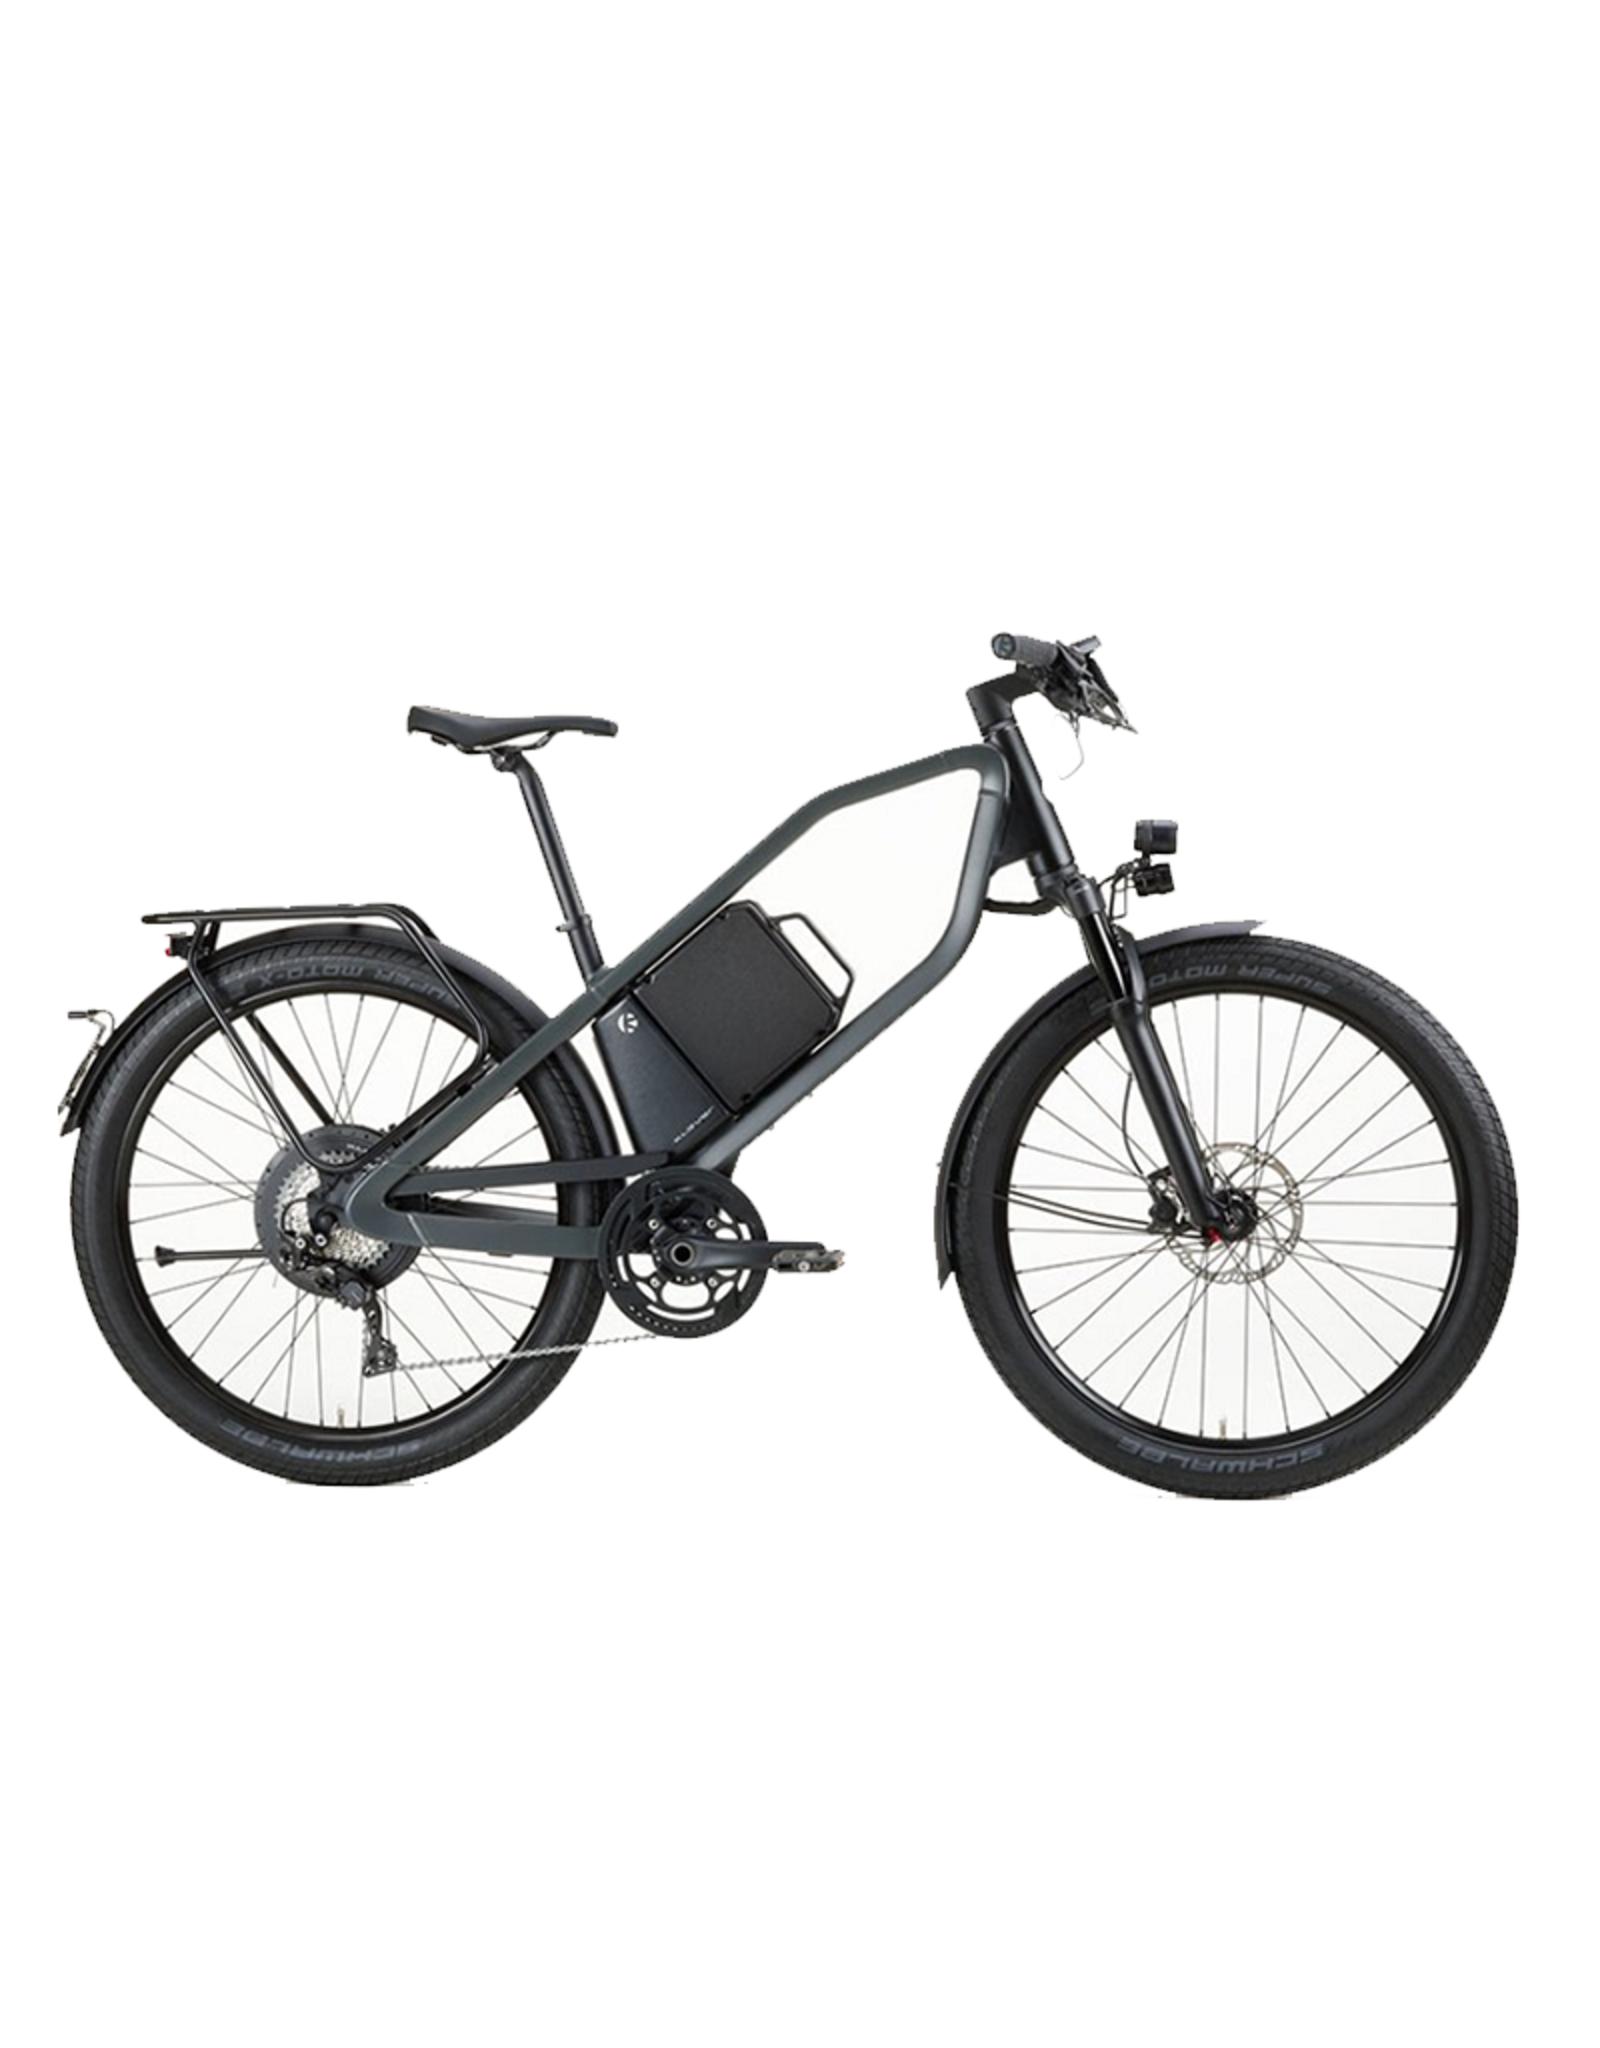 Klever X-Speed (model 2019)